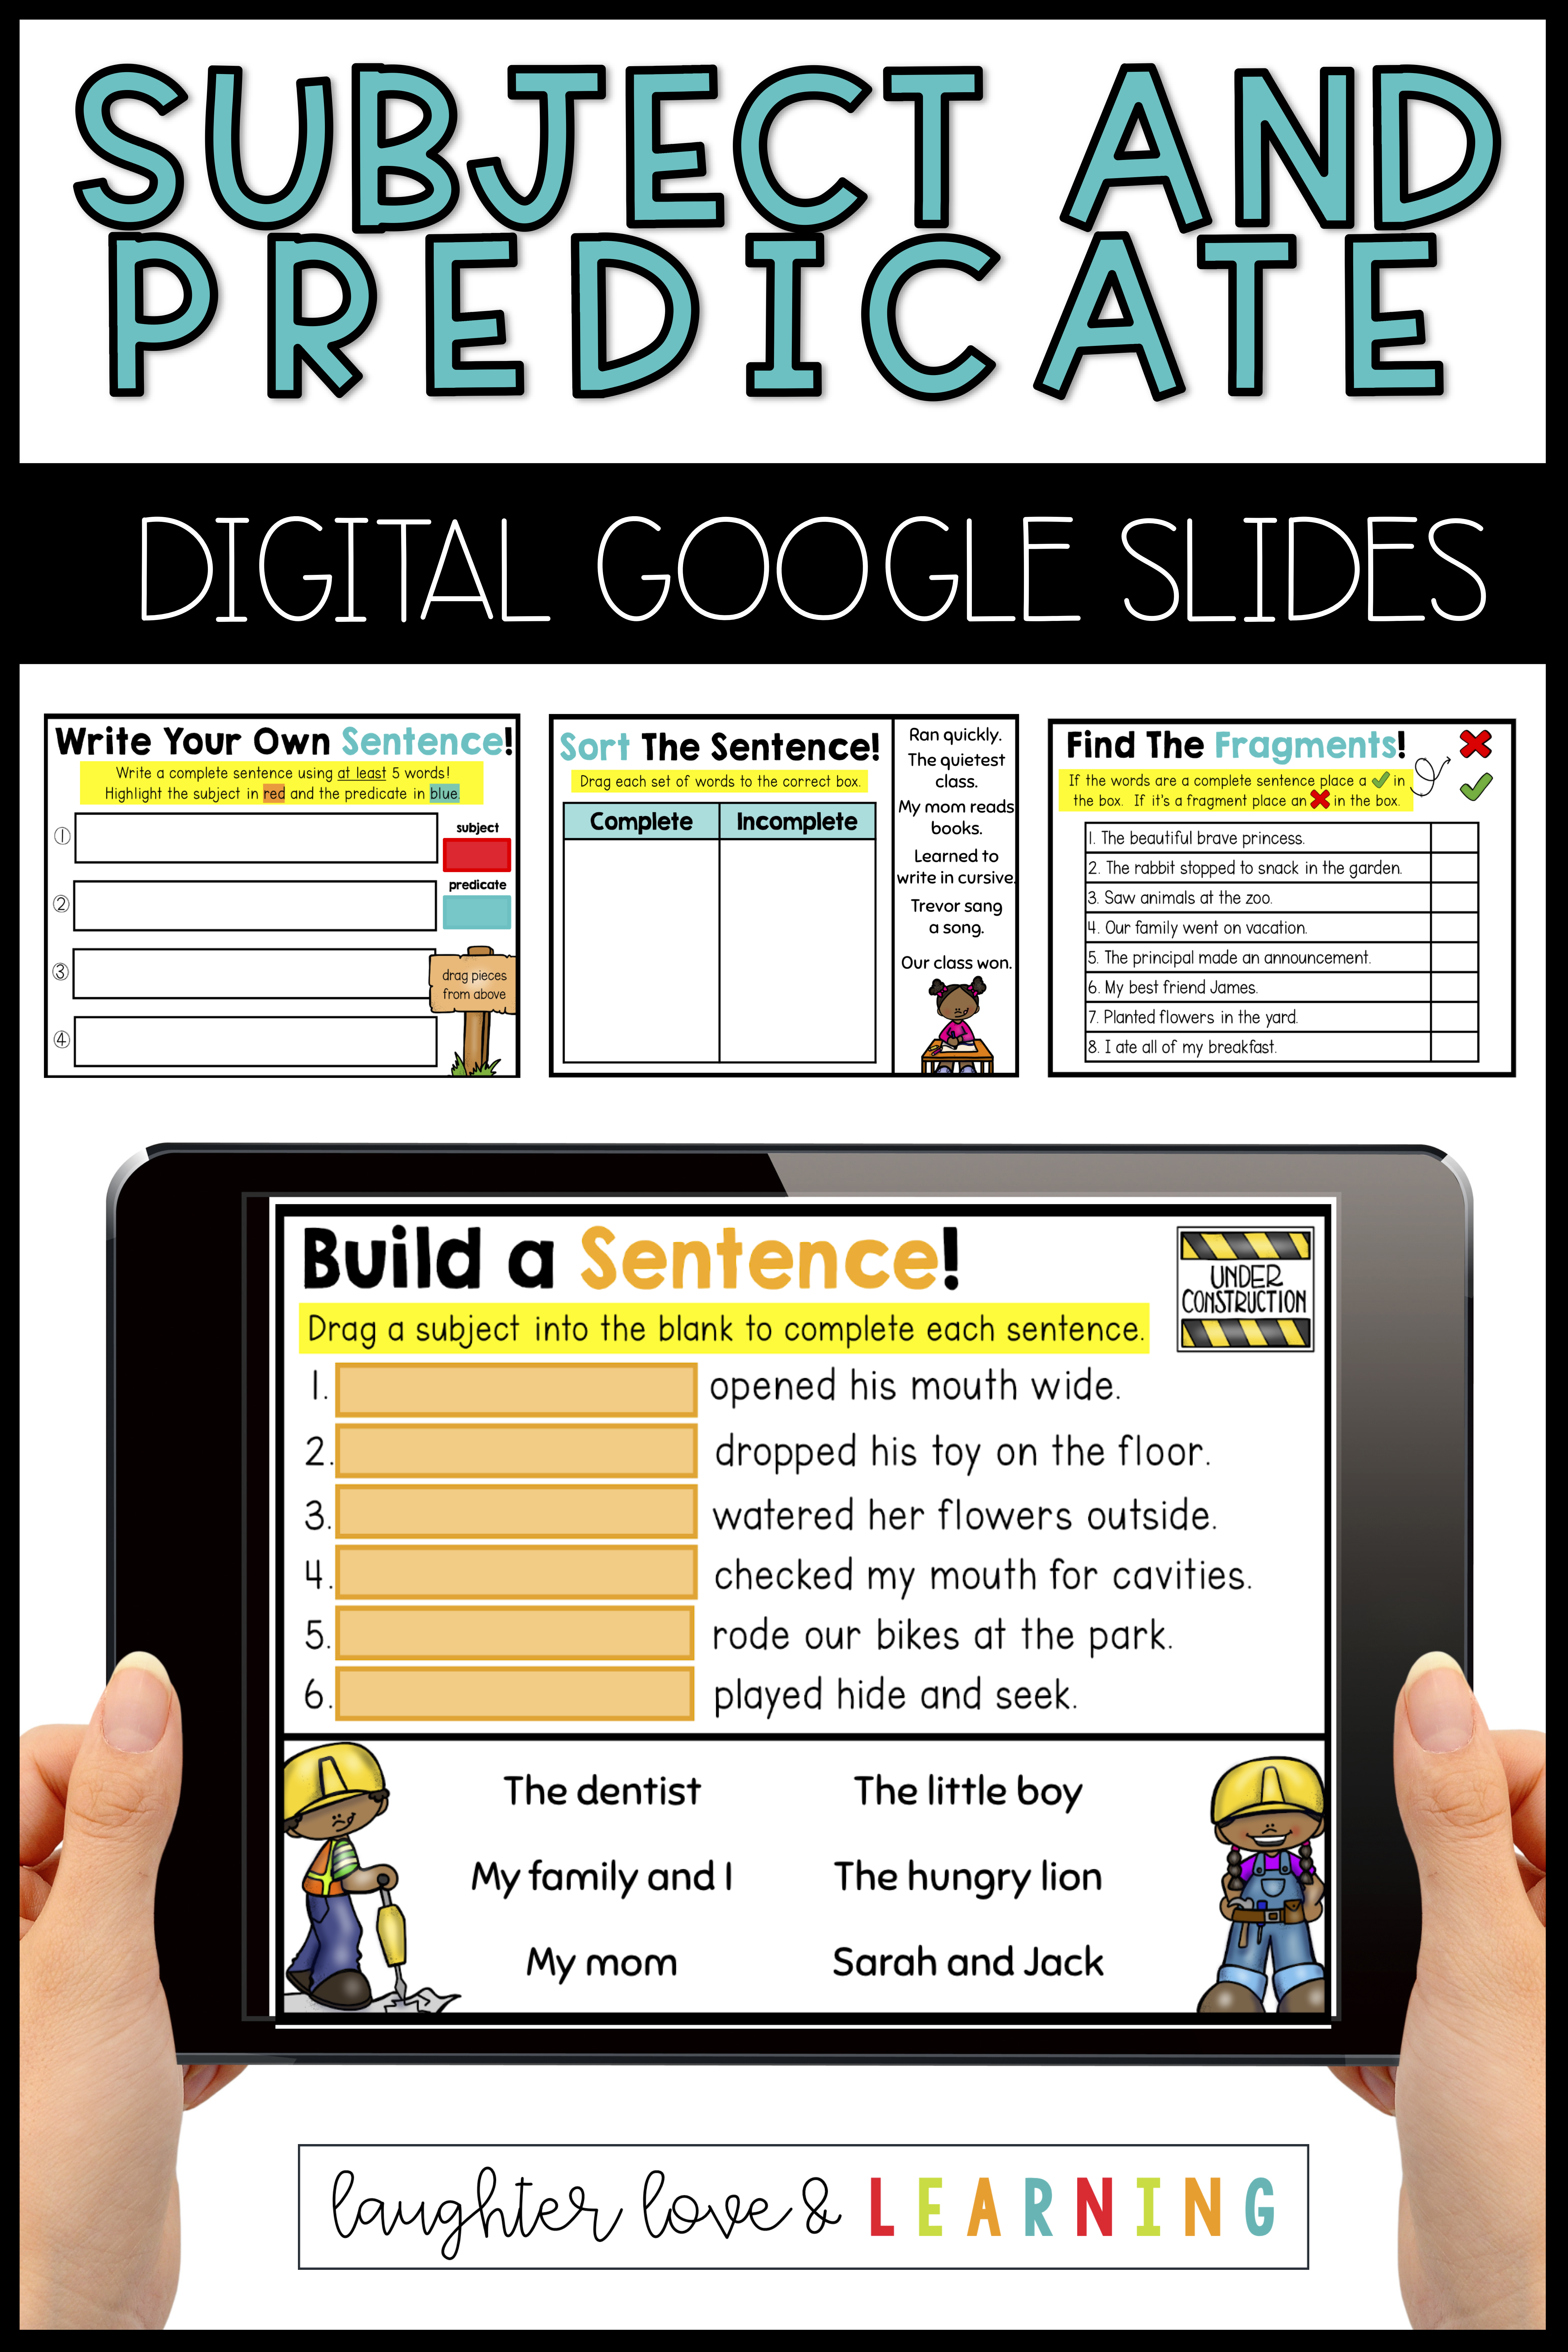 medium resolution of Subject and Predicate Practice: Digital Google Slides   Subject and  predicate